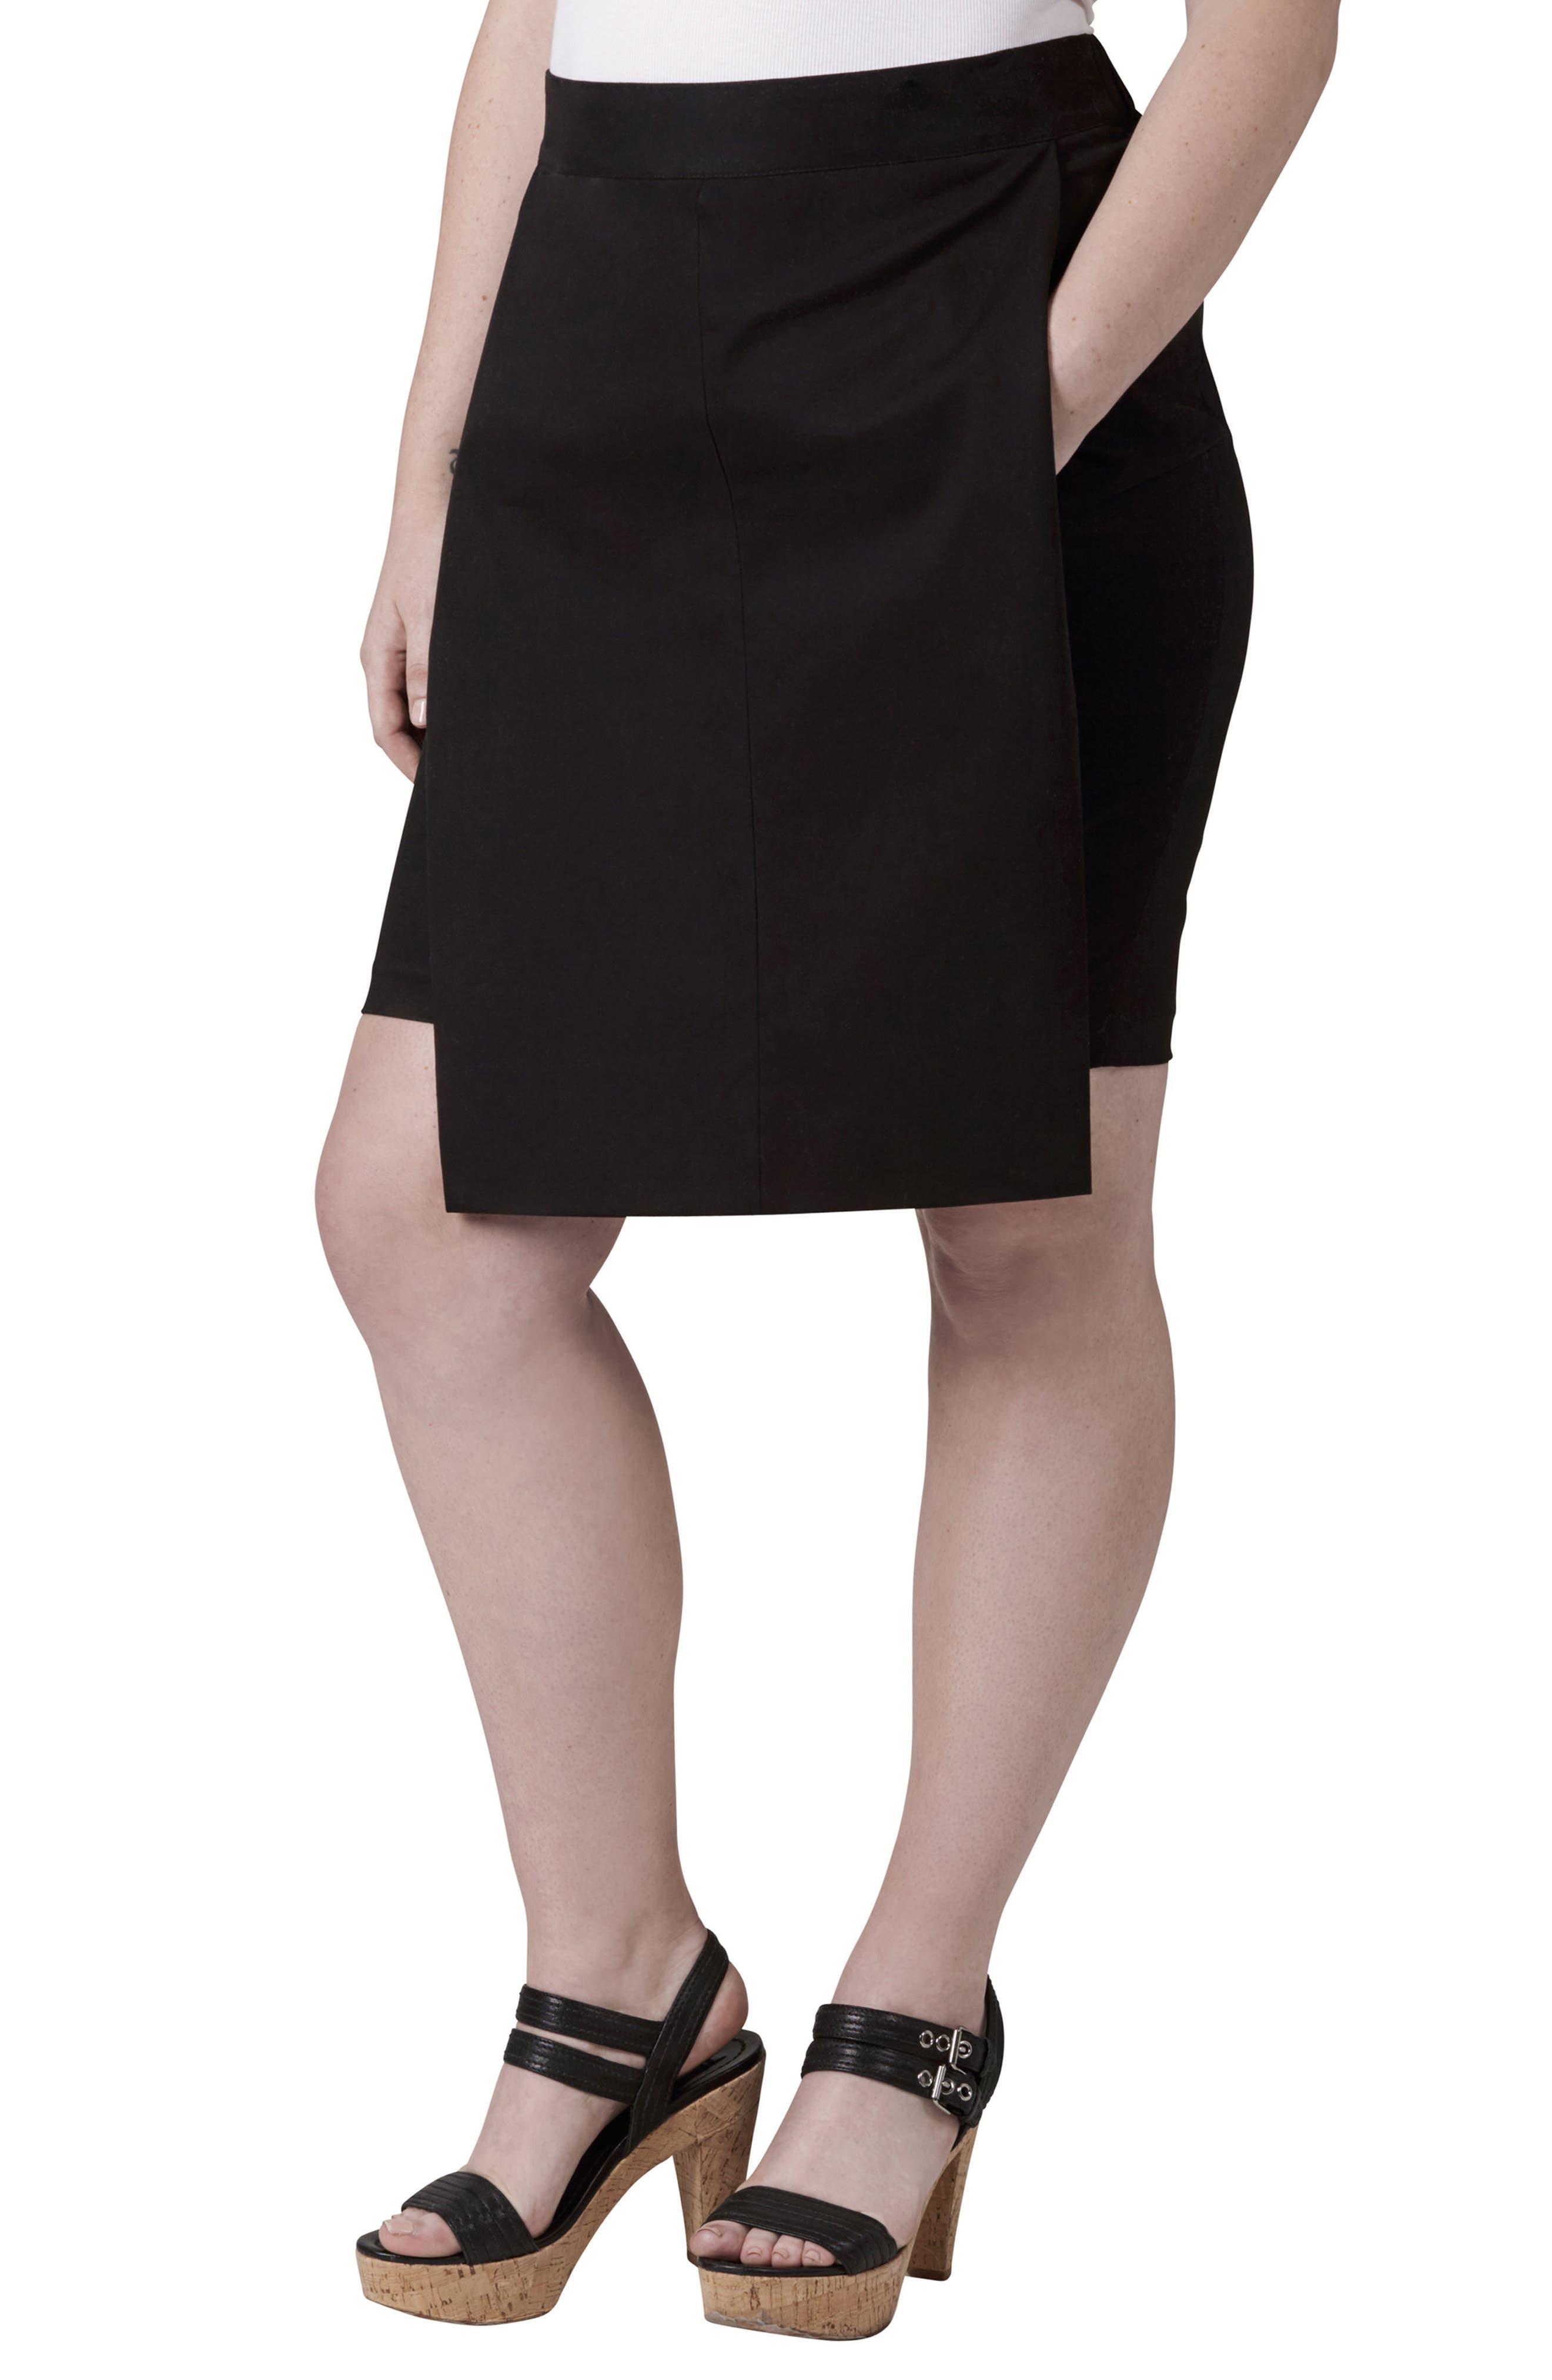 Alternate Image 1 Selected - UNIVERSAL STANDARD Ahr Skirt (Plus Size)